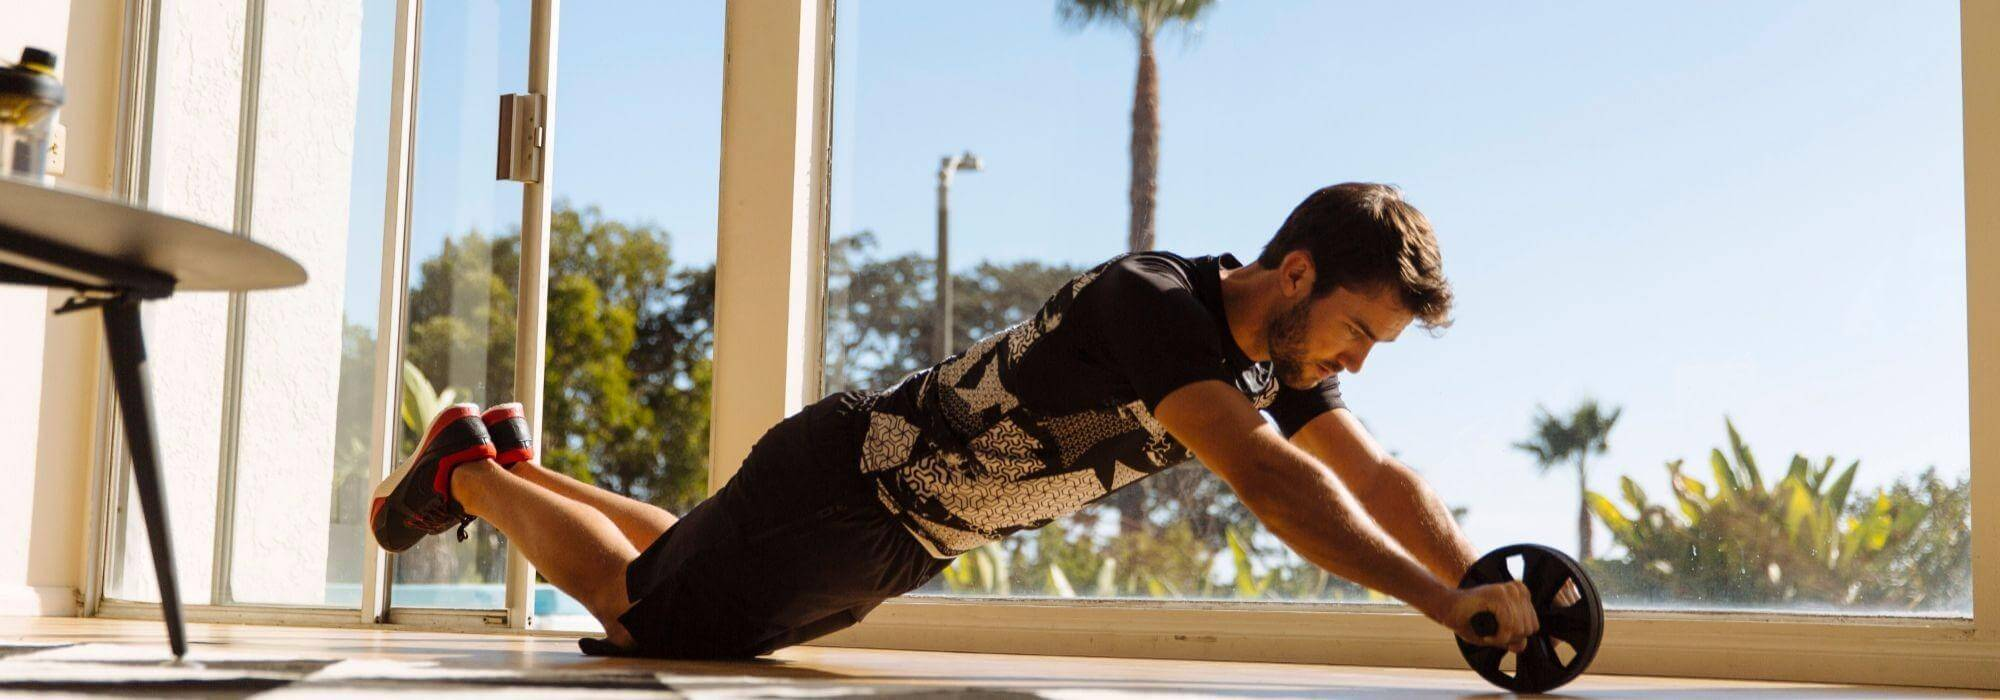 Top 3 Ab Wheel Video Exercises & Their Benefits